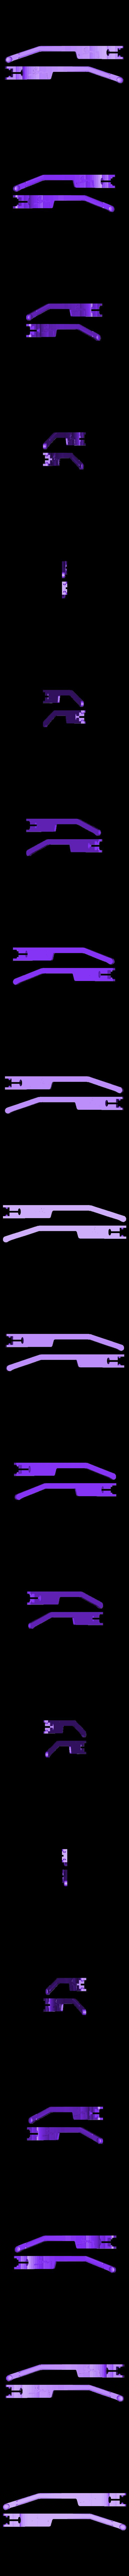 Arms_straight.stl Download free STL file POP Glasses • 3D printable template, SimonePDA